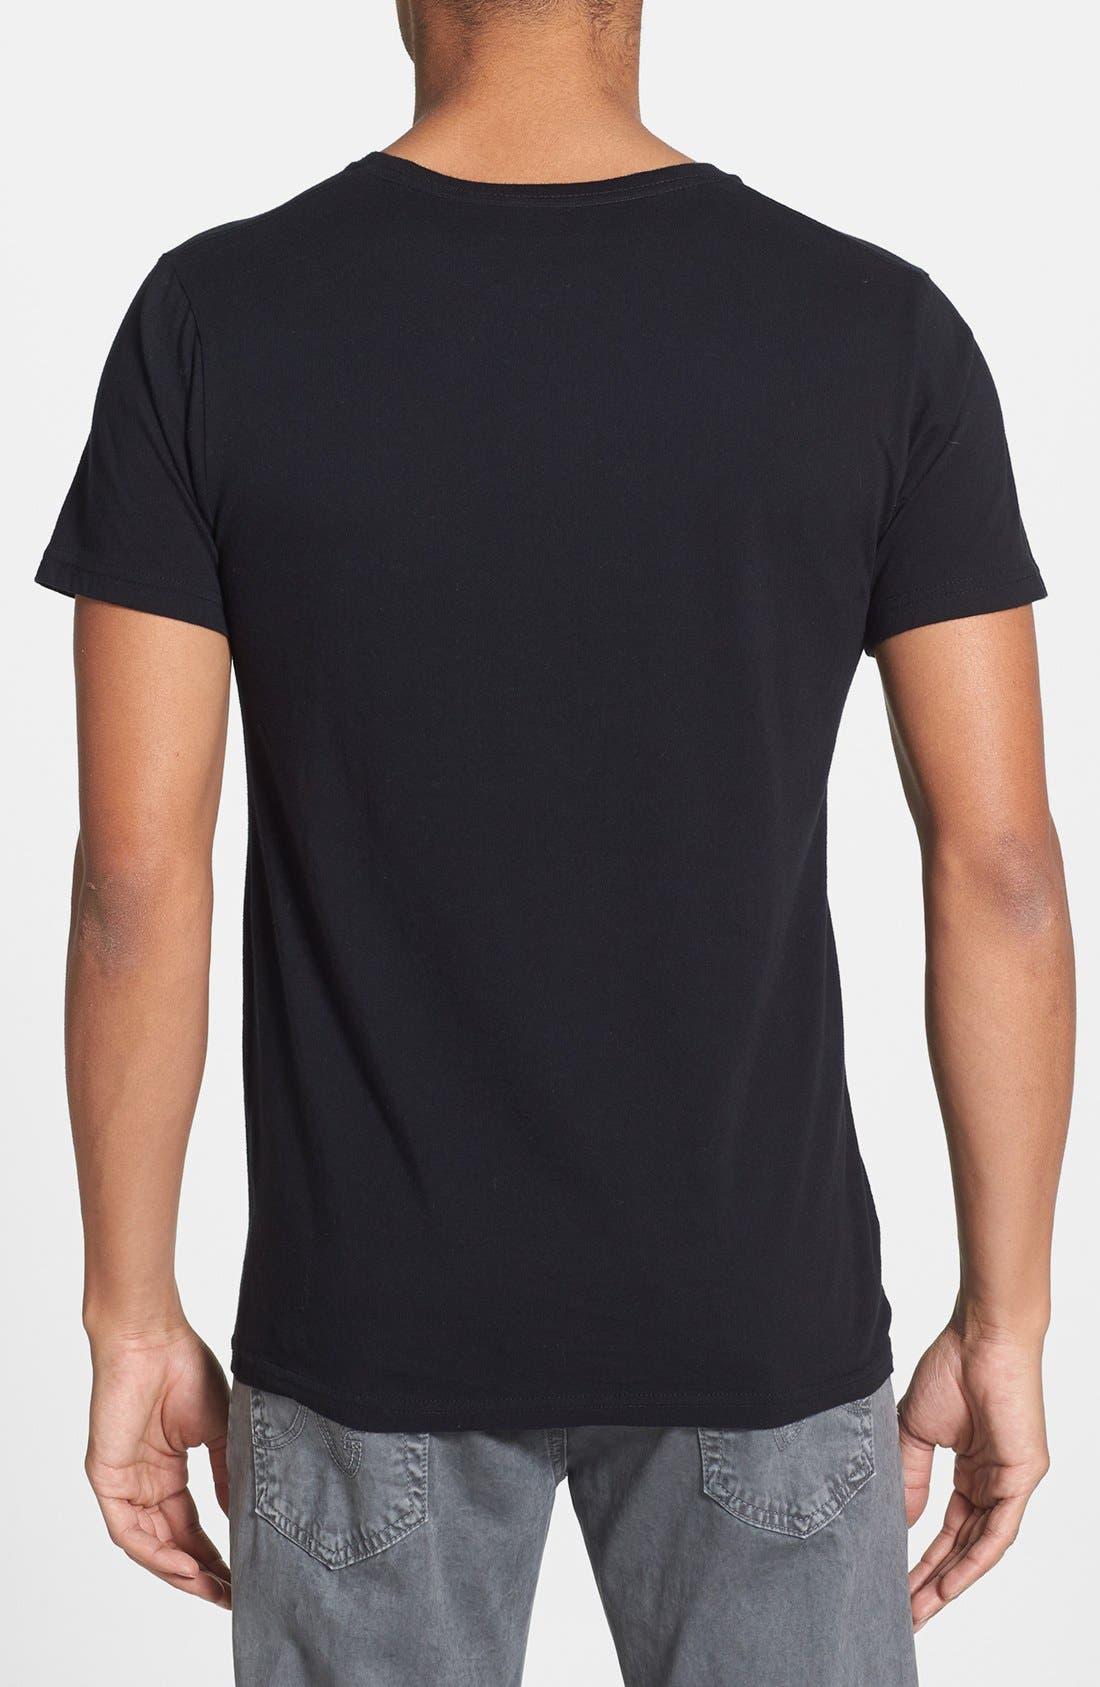 Alternate Image 2  - Retro Brand 'Oregon State Beavers' Graphic T-Shirt